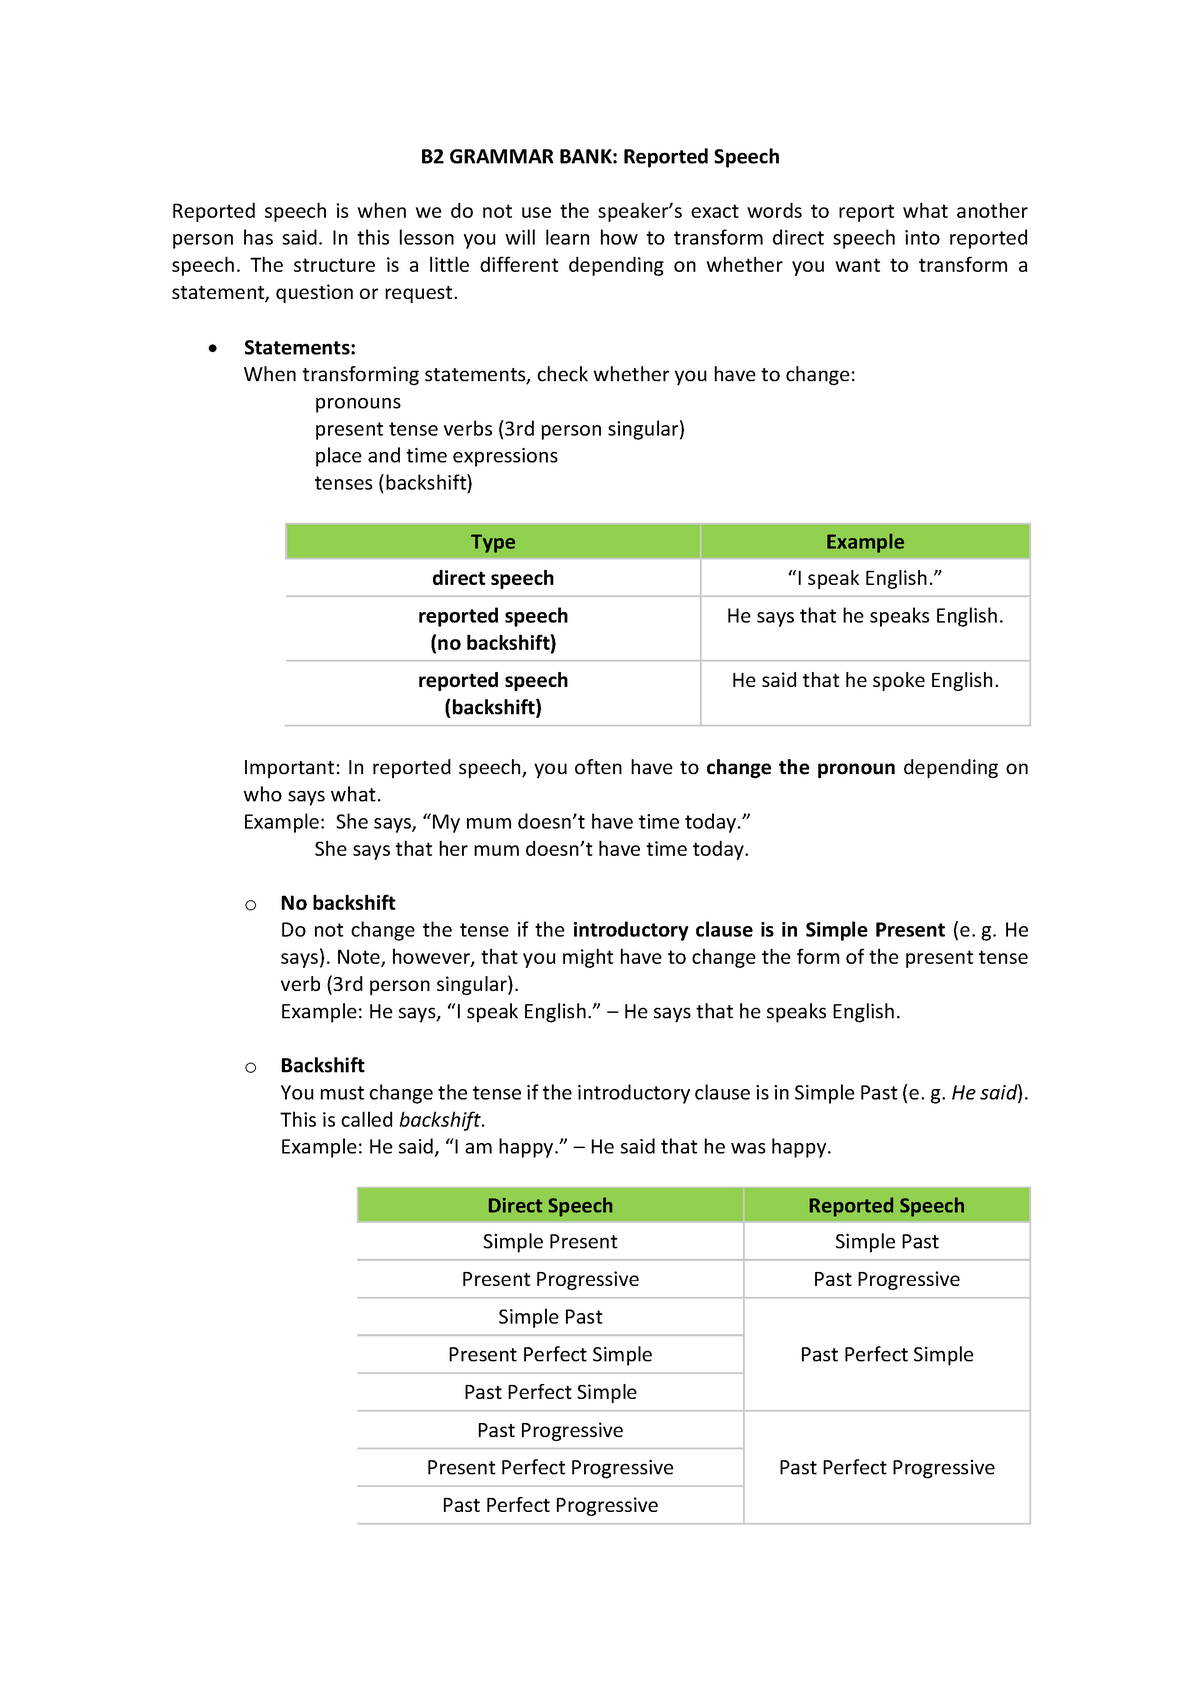 B2 Grammar Bank - Reported Speech - Inglés I 10294 - UAM